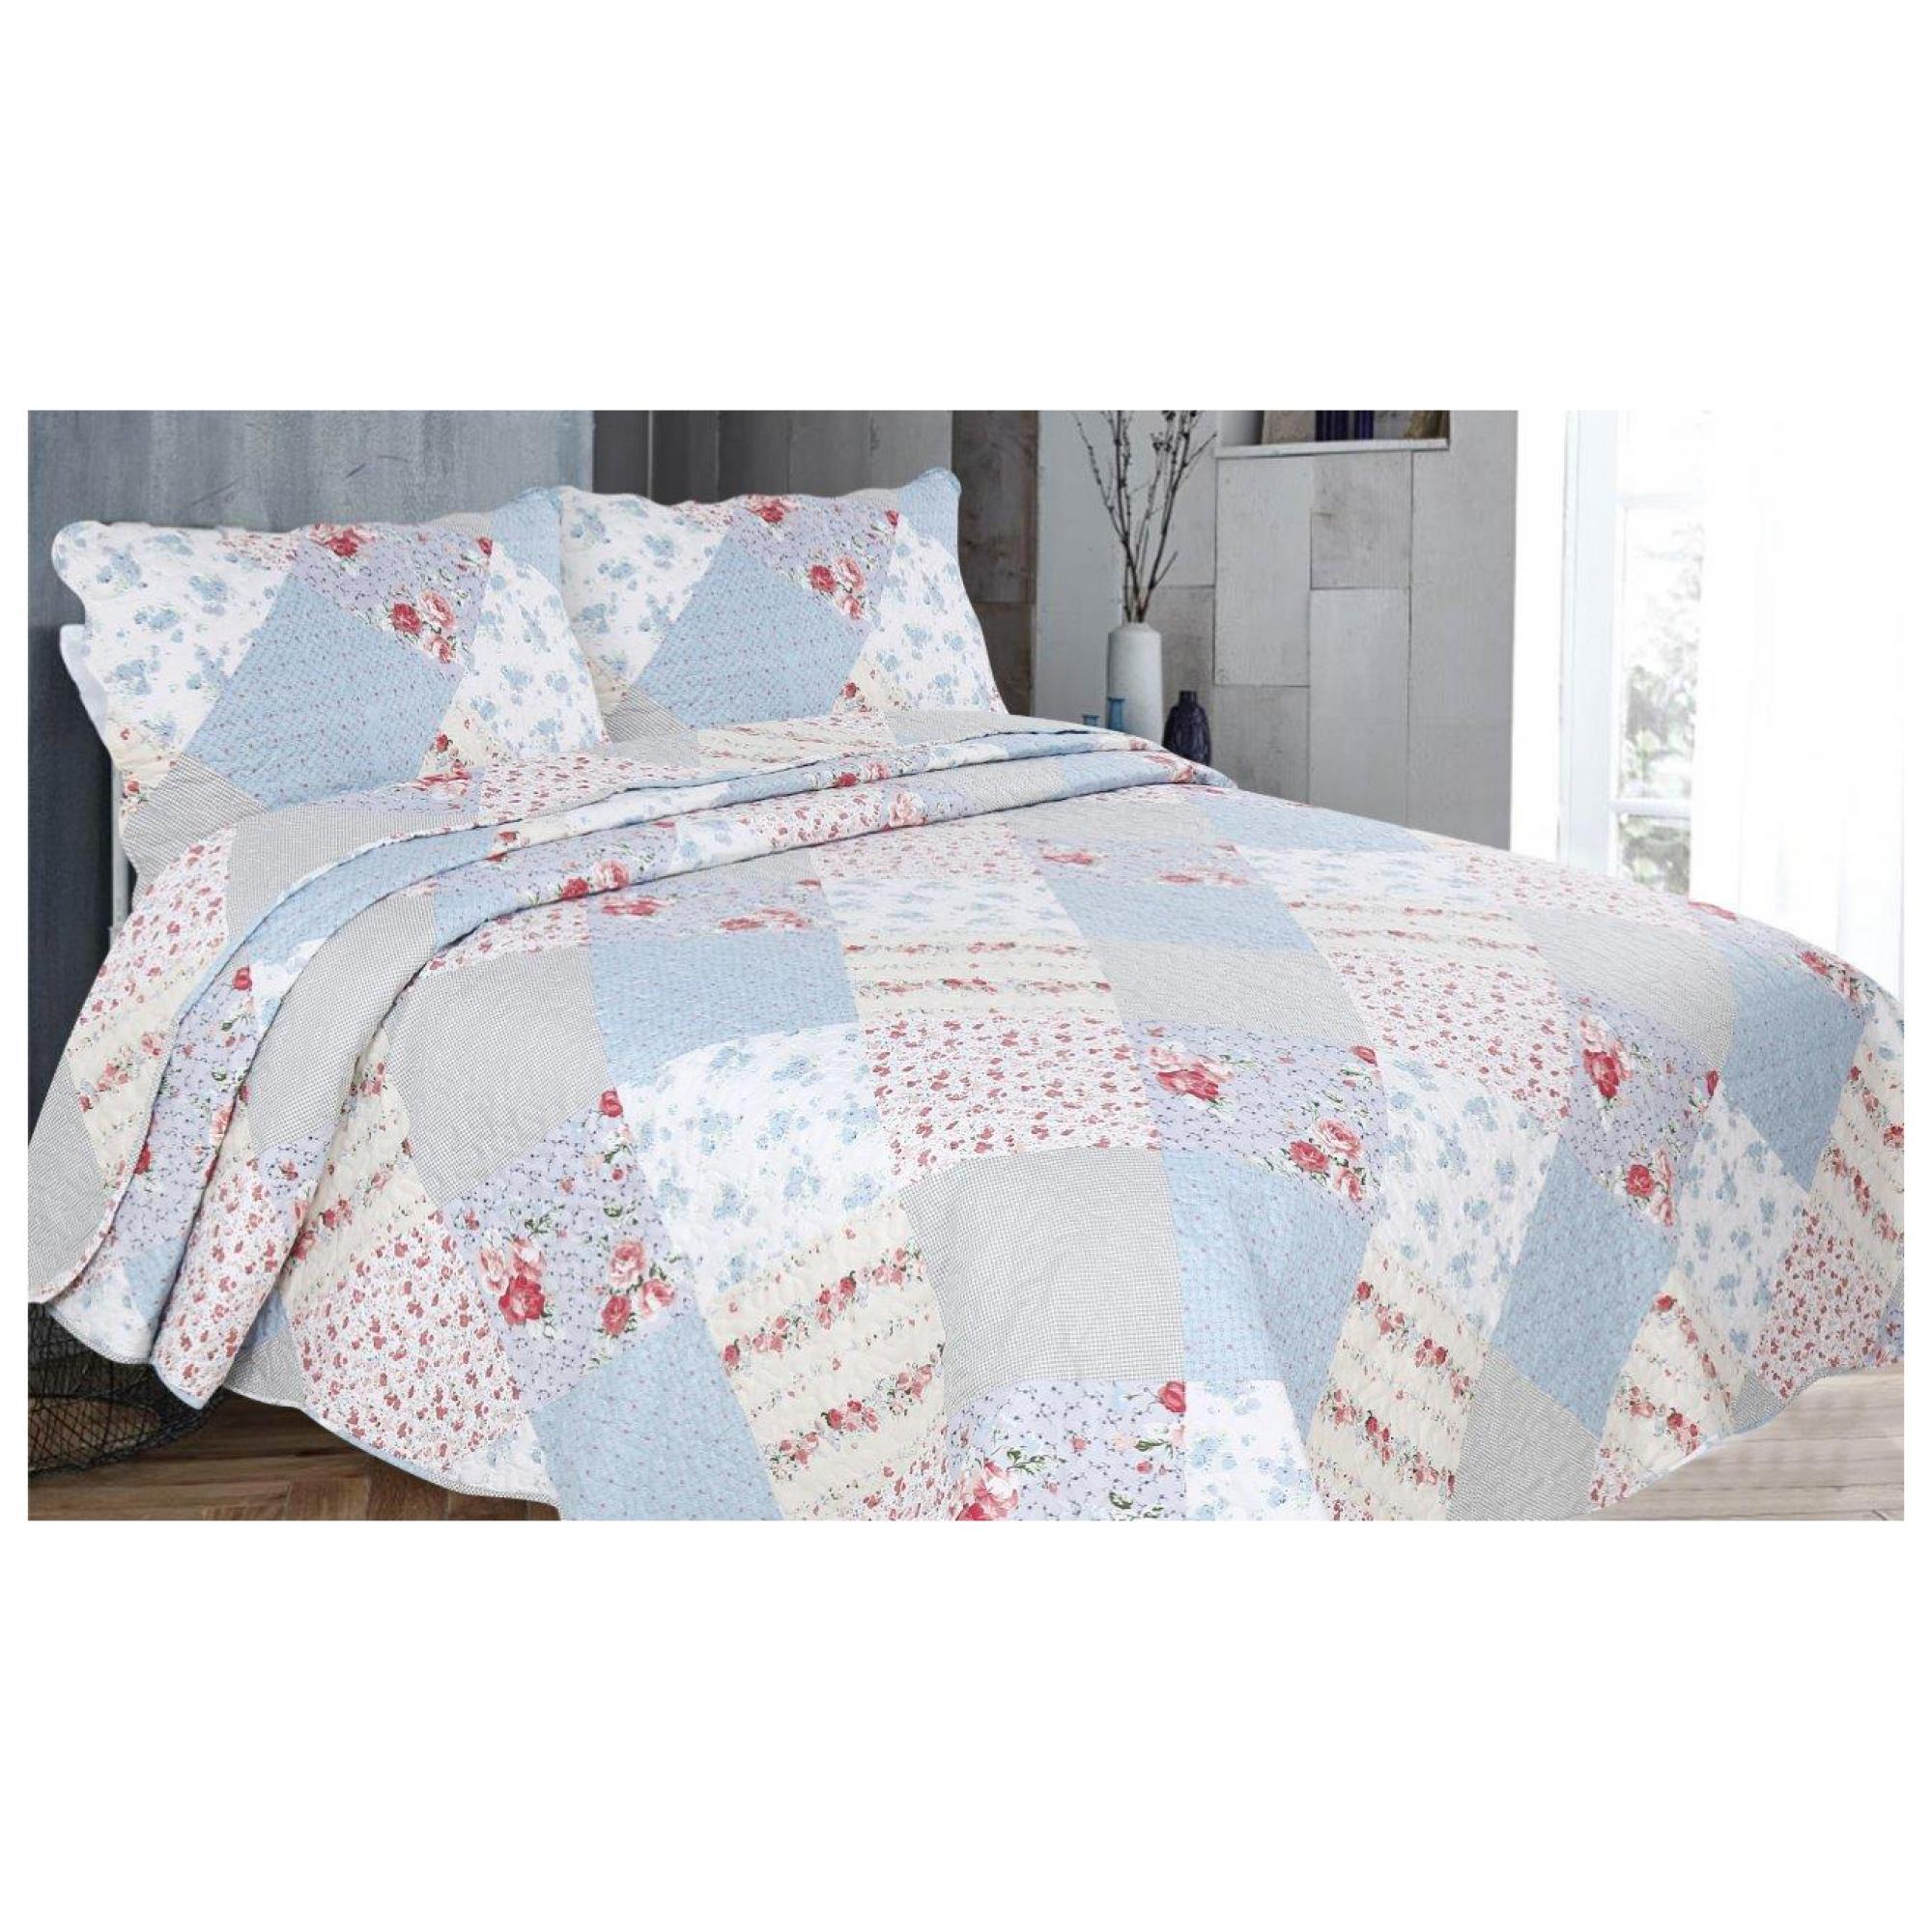 3PC PRINTED BED SPREAD BROK HAMPTON MULTI